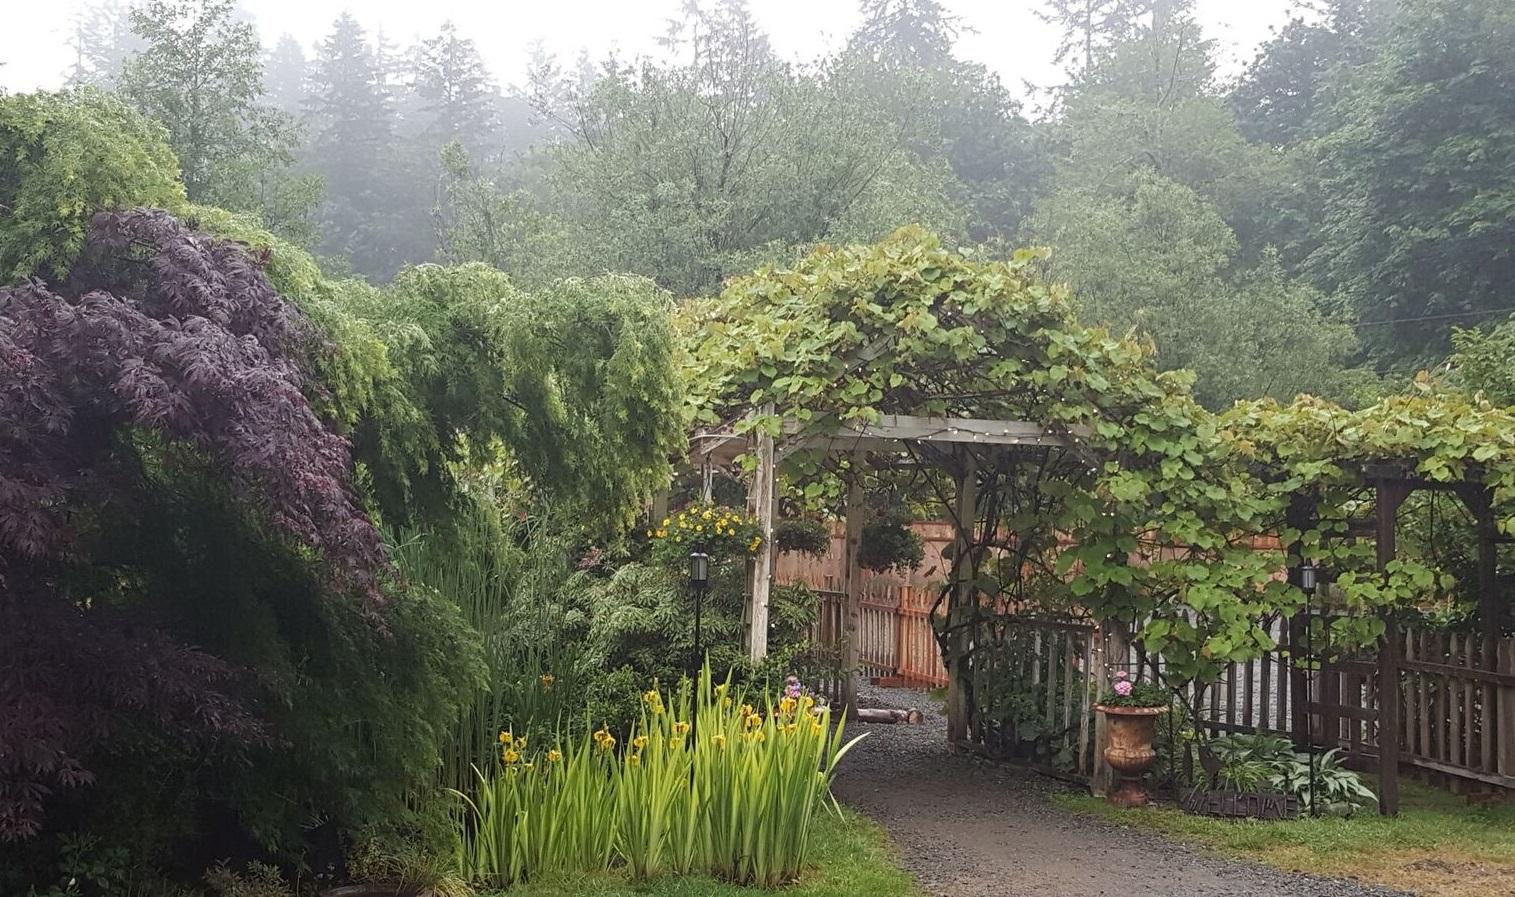 A foggy mid-May morning